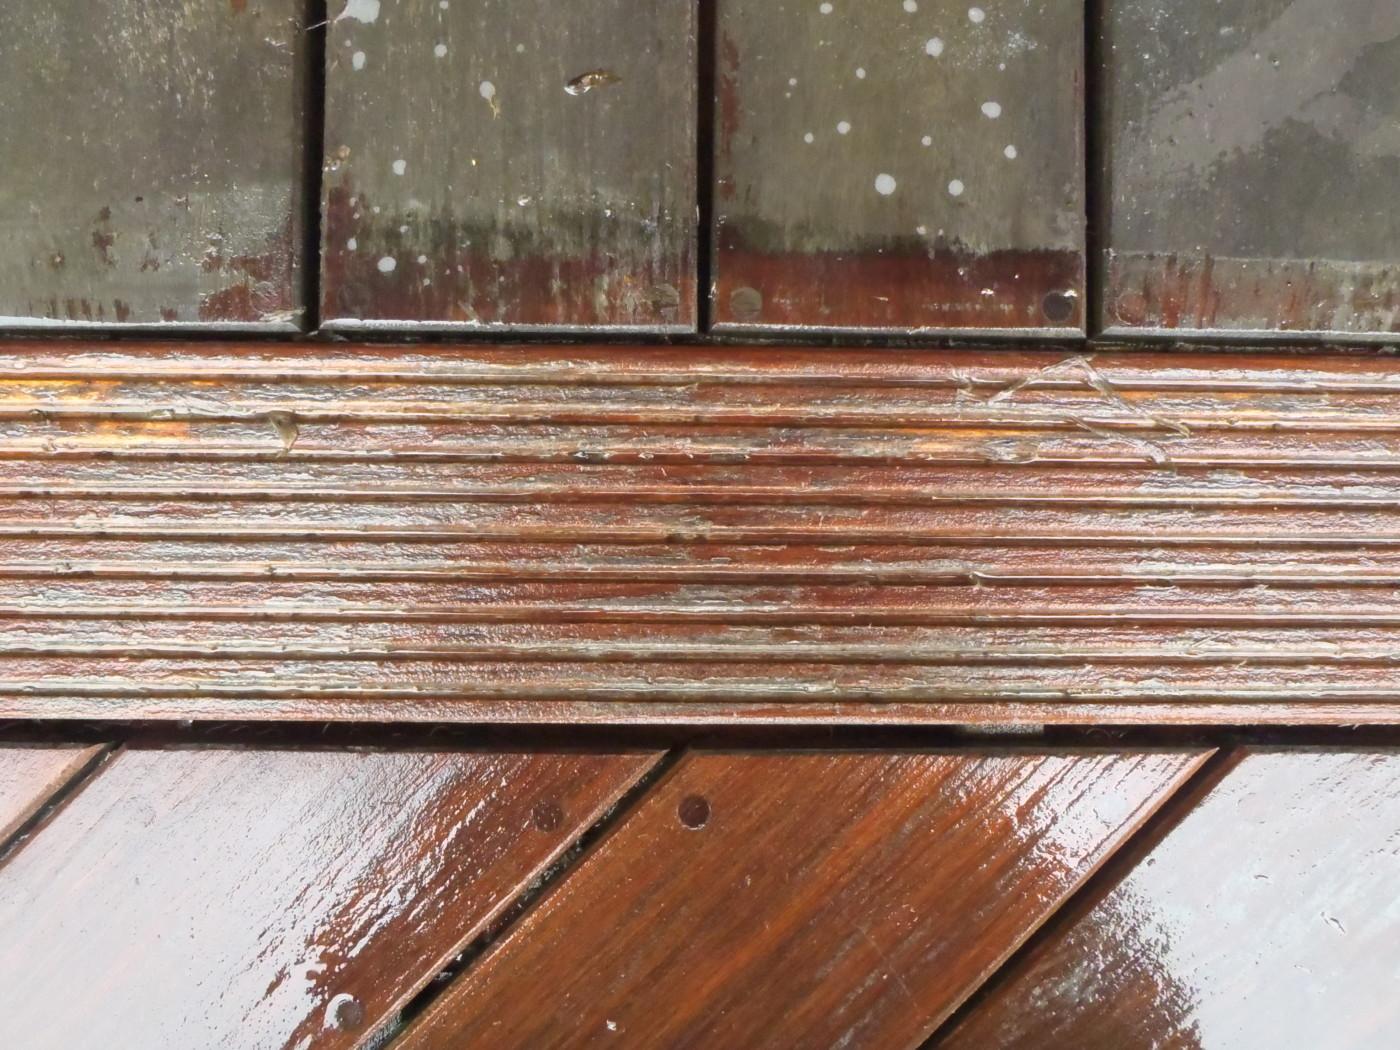 comment nettoyer terrasse bois interesting comment nettoyer et entretenir sa terrasse en bois. Black Bedroom Furniture Sets. Home Design Ideas